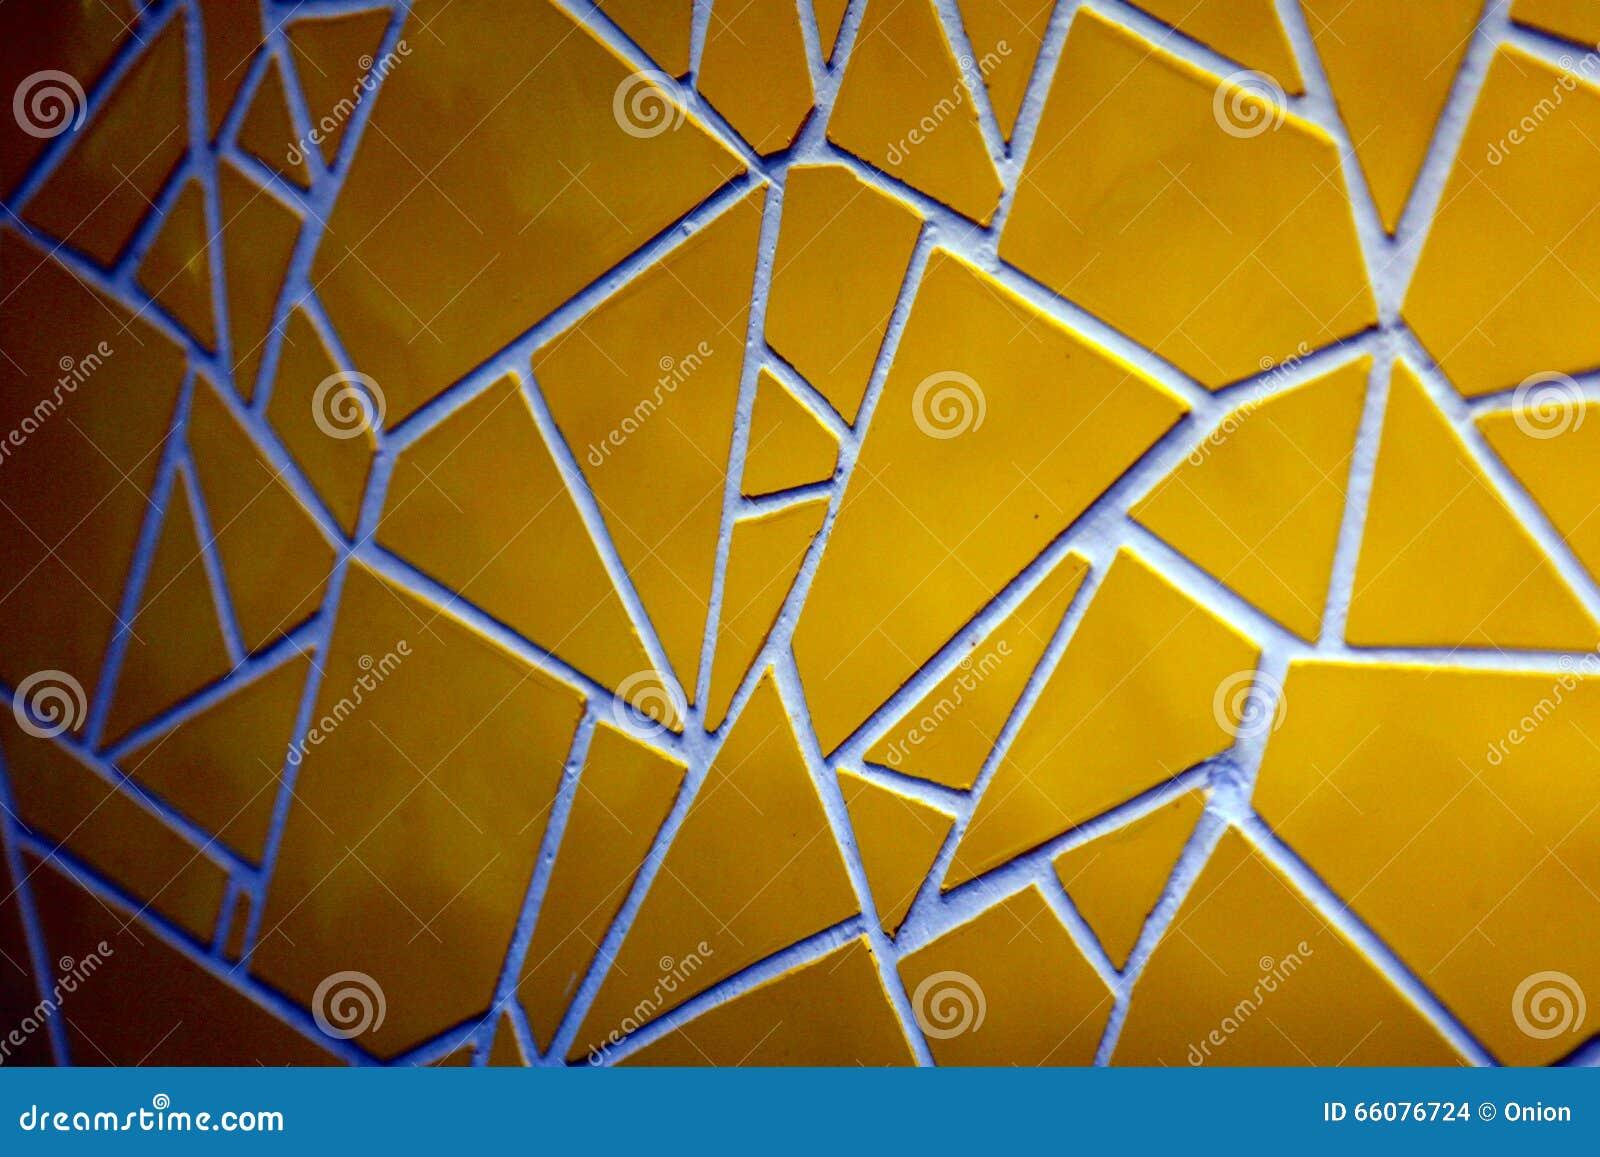 Cracked yellow tiles